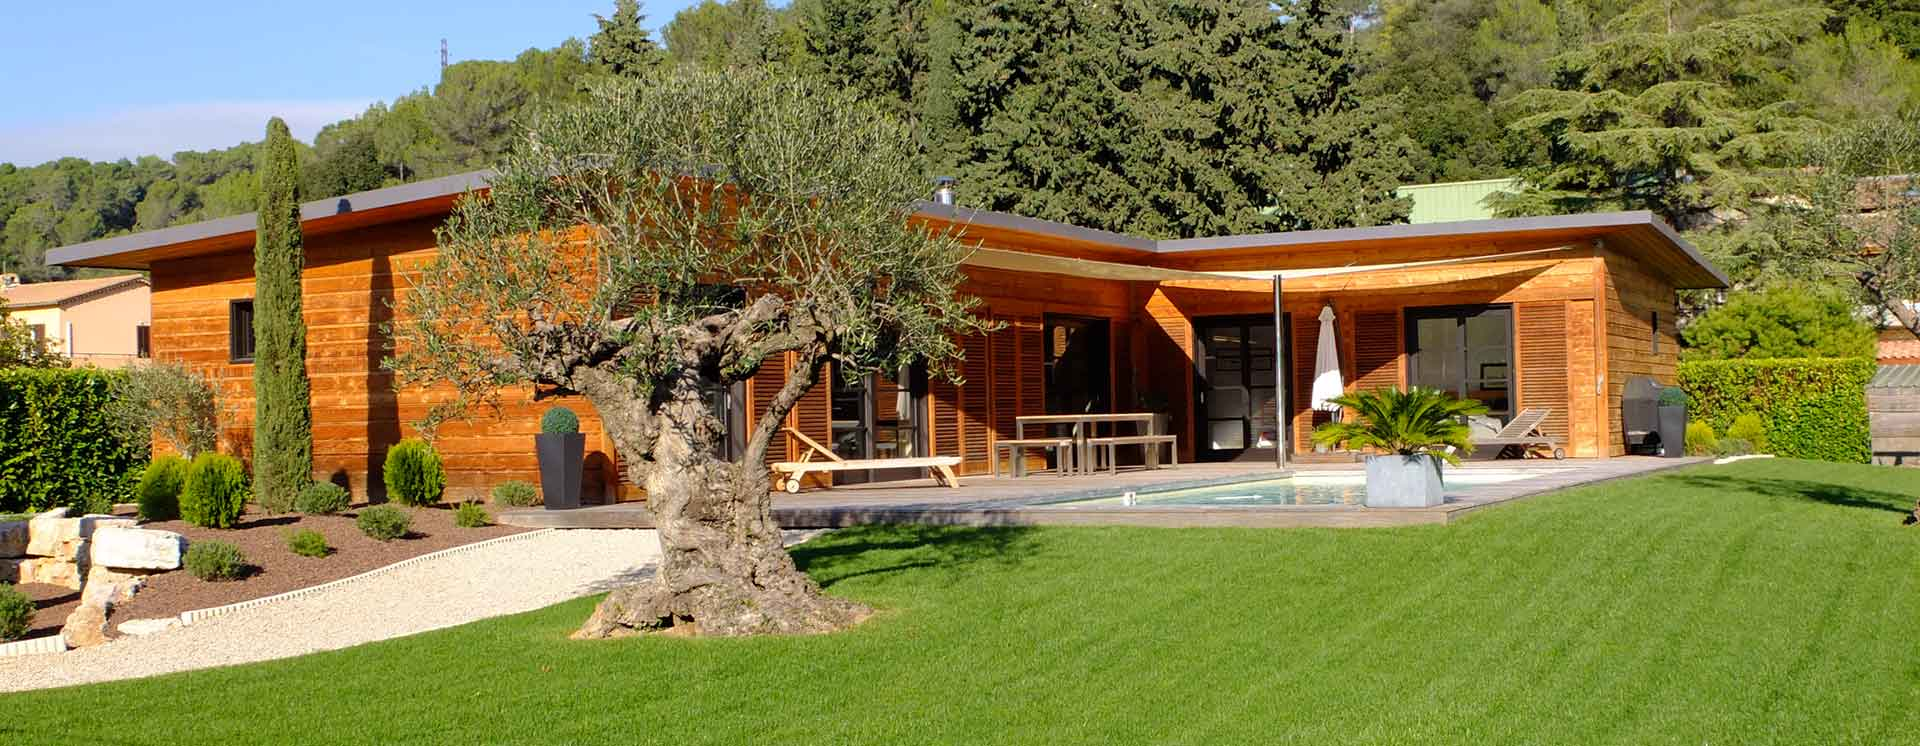 paysagiste nice collines jardins 06 04 93 37 84 31. Black Bedroom Furniture Sets. Home Design Ideas